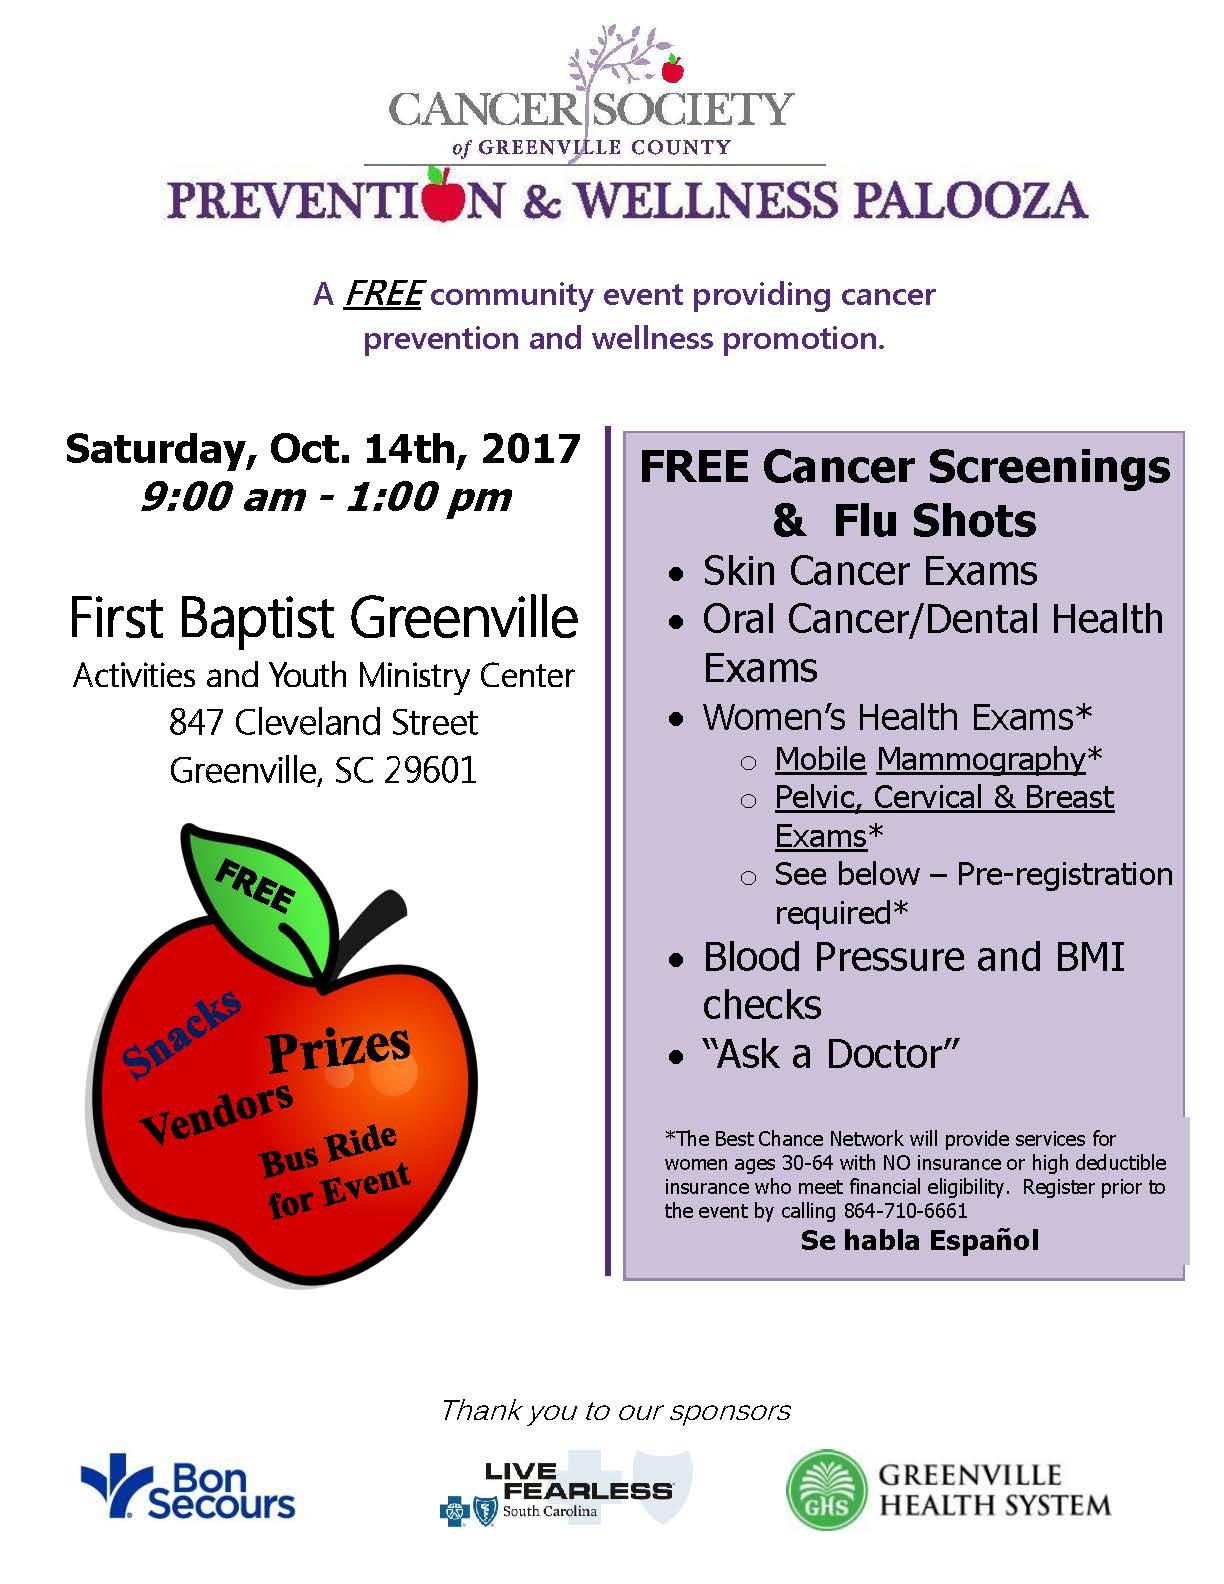 Prevention Palooza 2017 Flyer.jpg